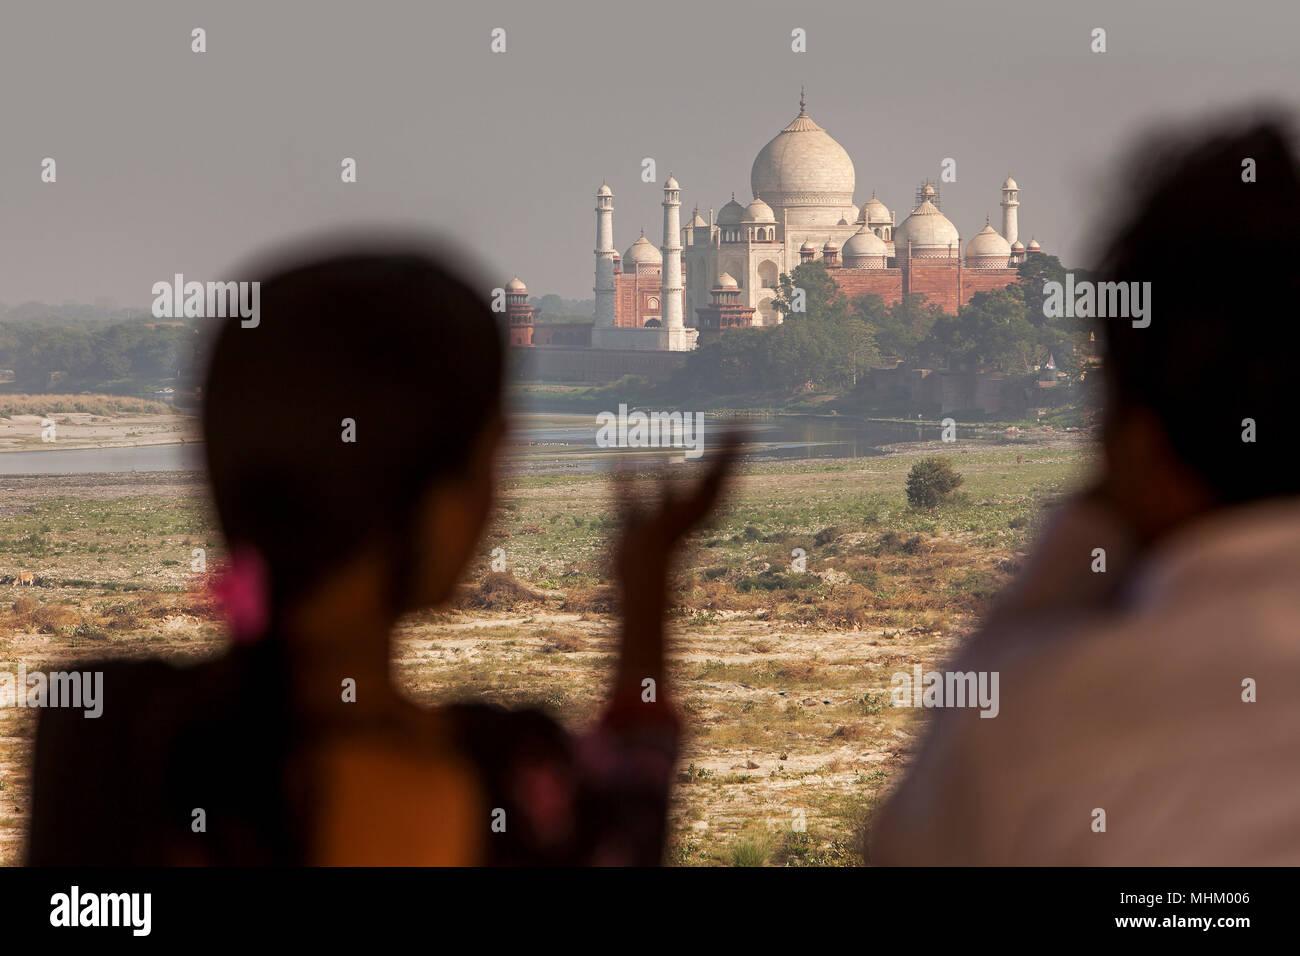 Taj Mahal, UNESCO-Weltkulturerbe, Agra, Uttar Pradesh, Indien Stockbild